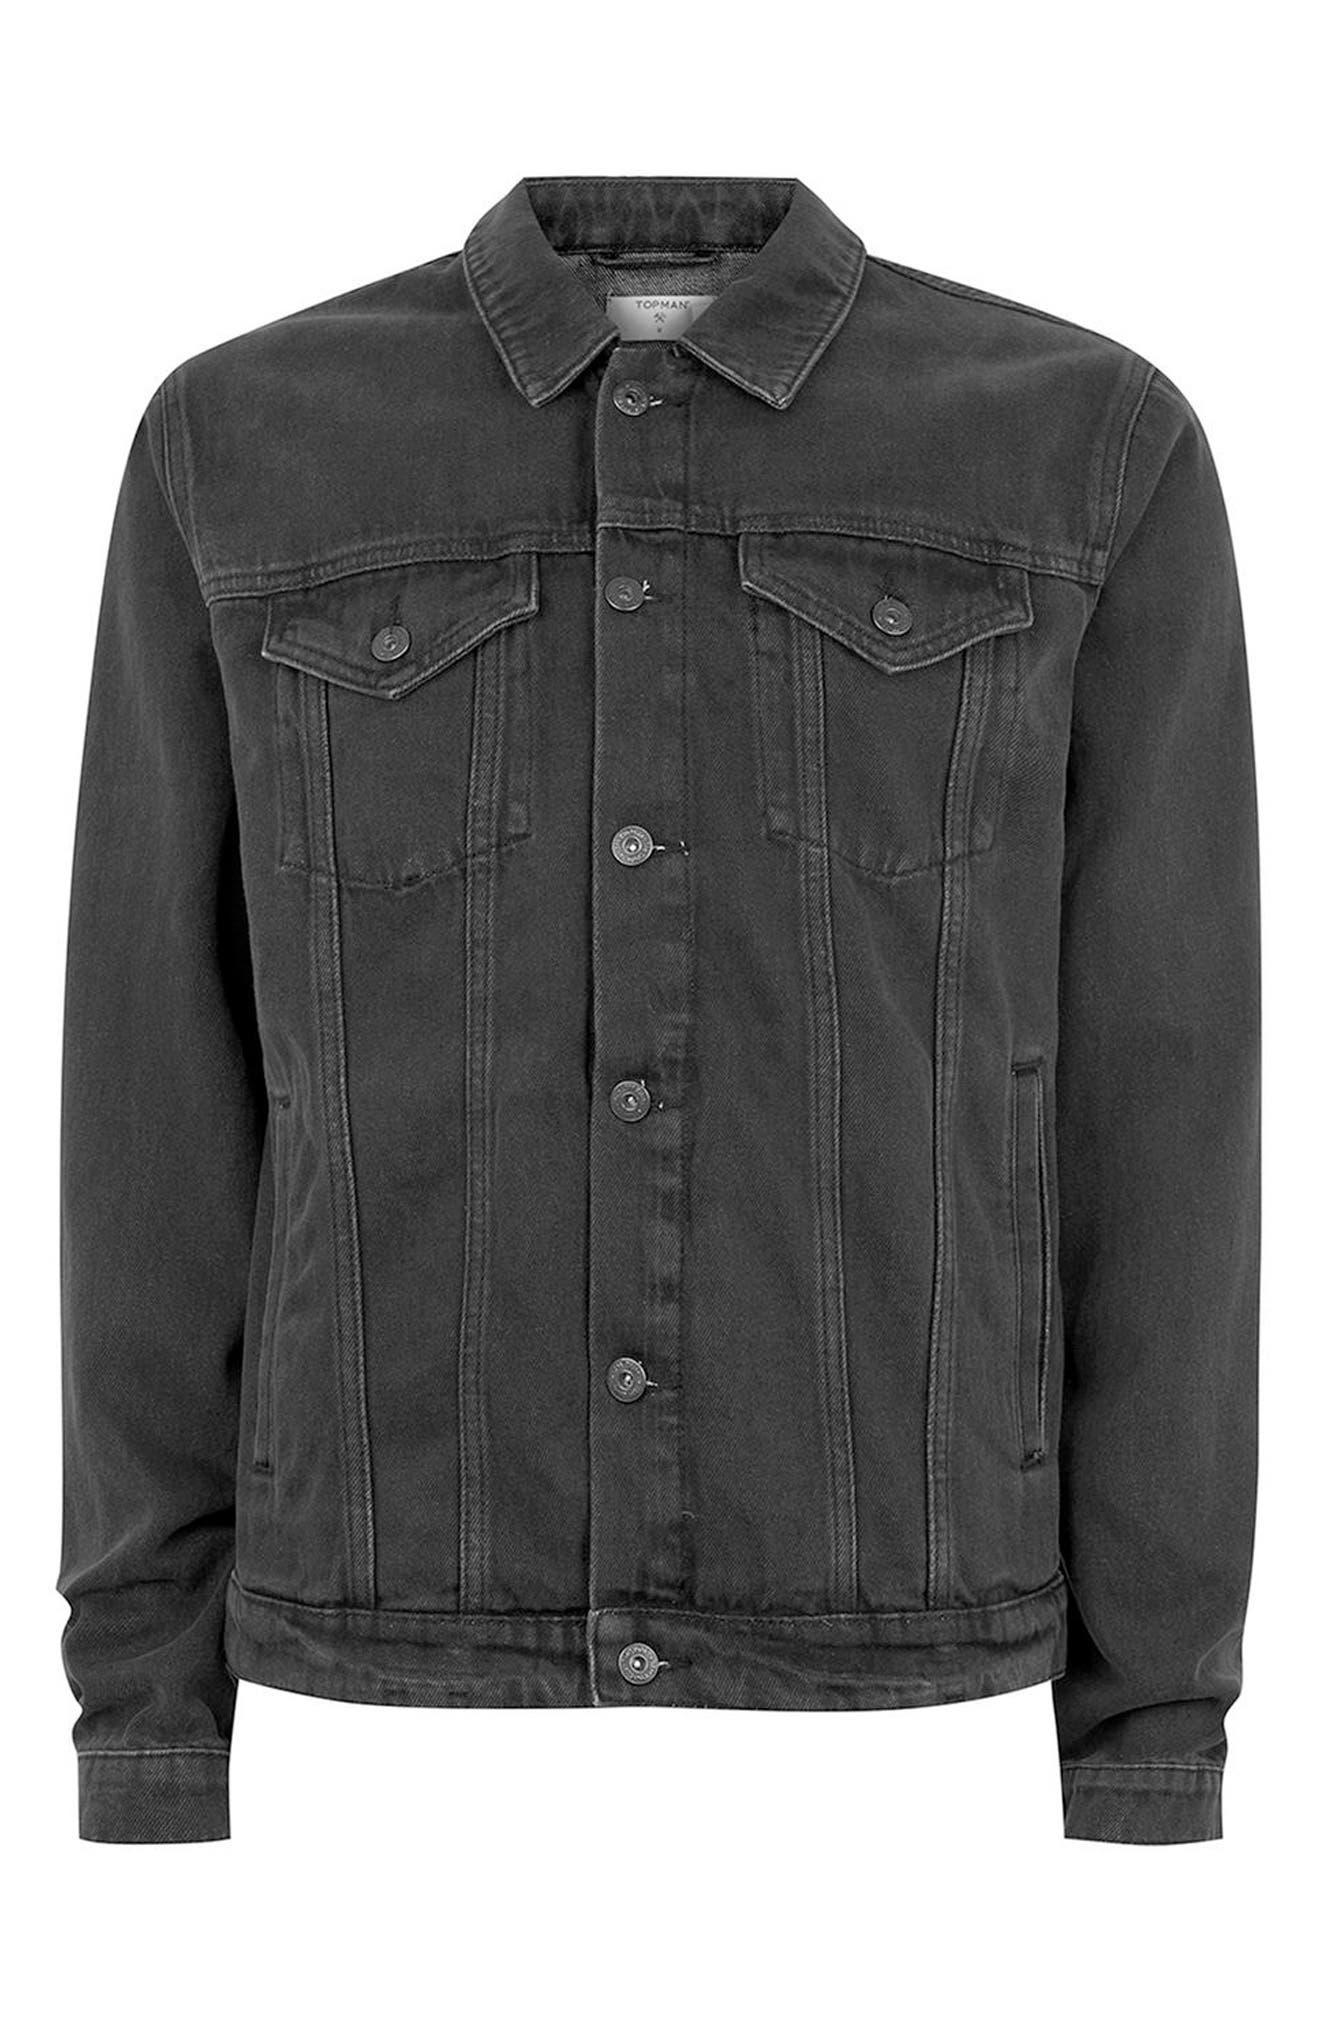 Western Denim Jacket,                             Alternate thumbnail 5, color,                             Black